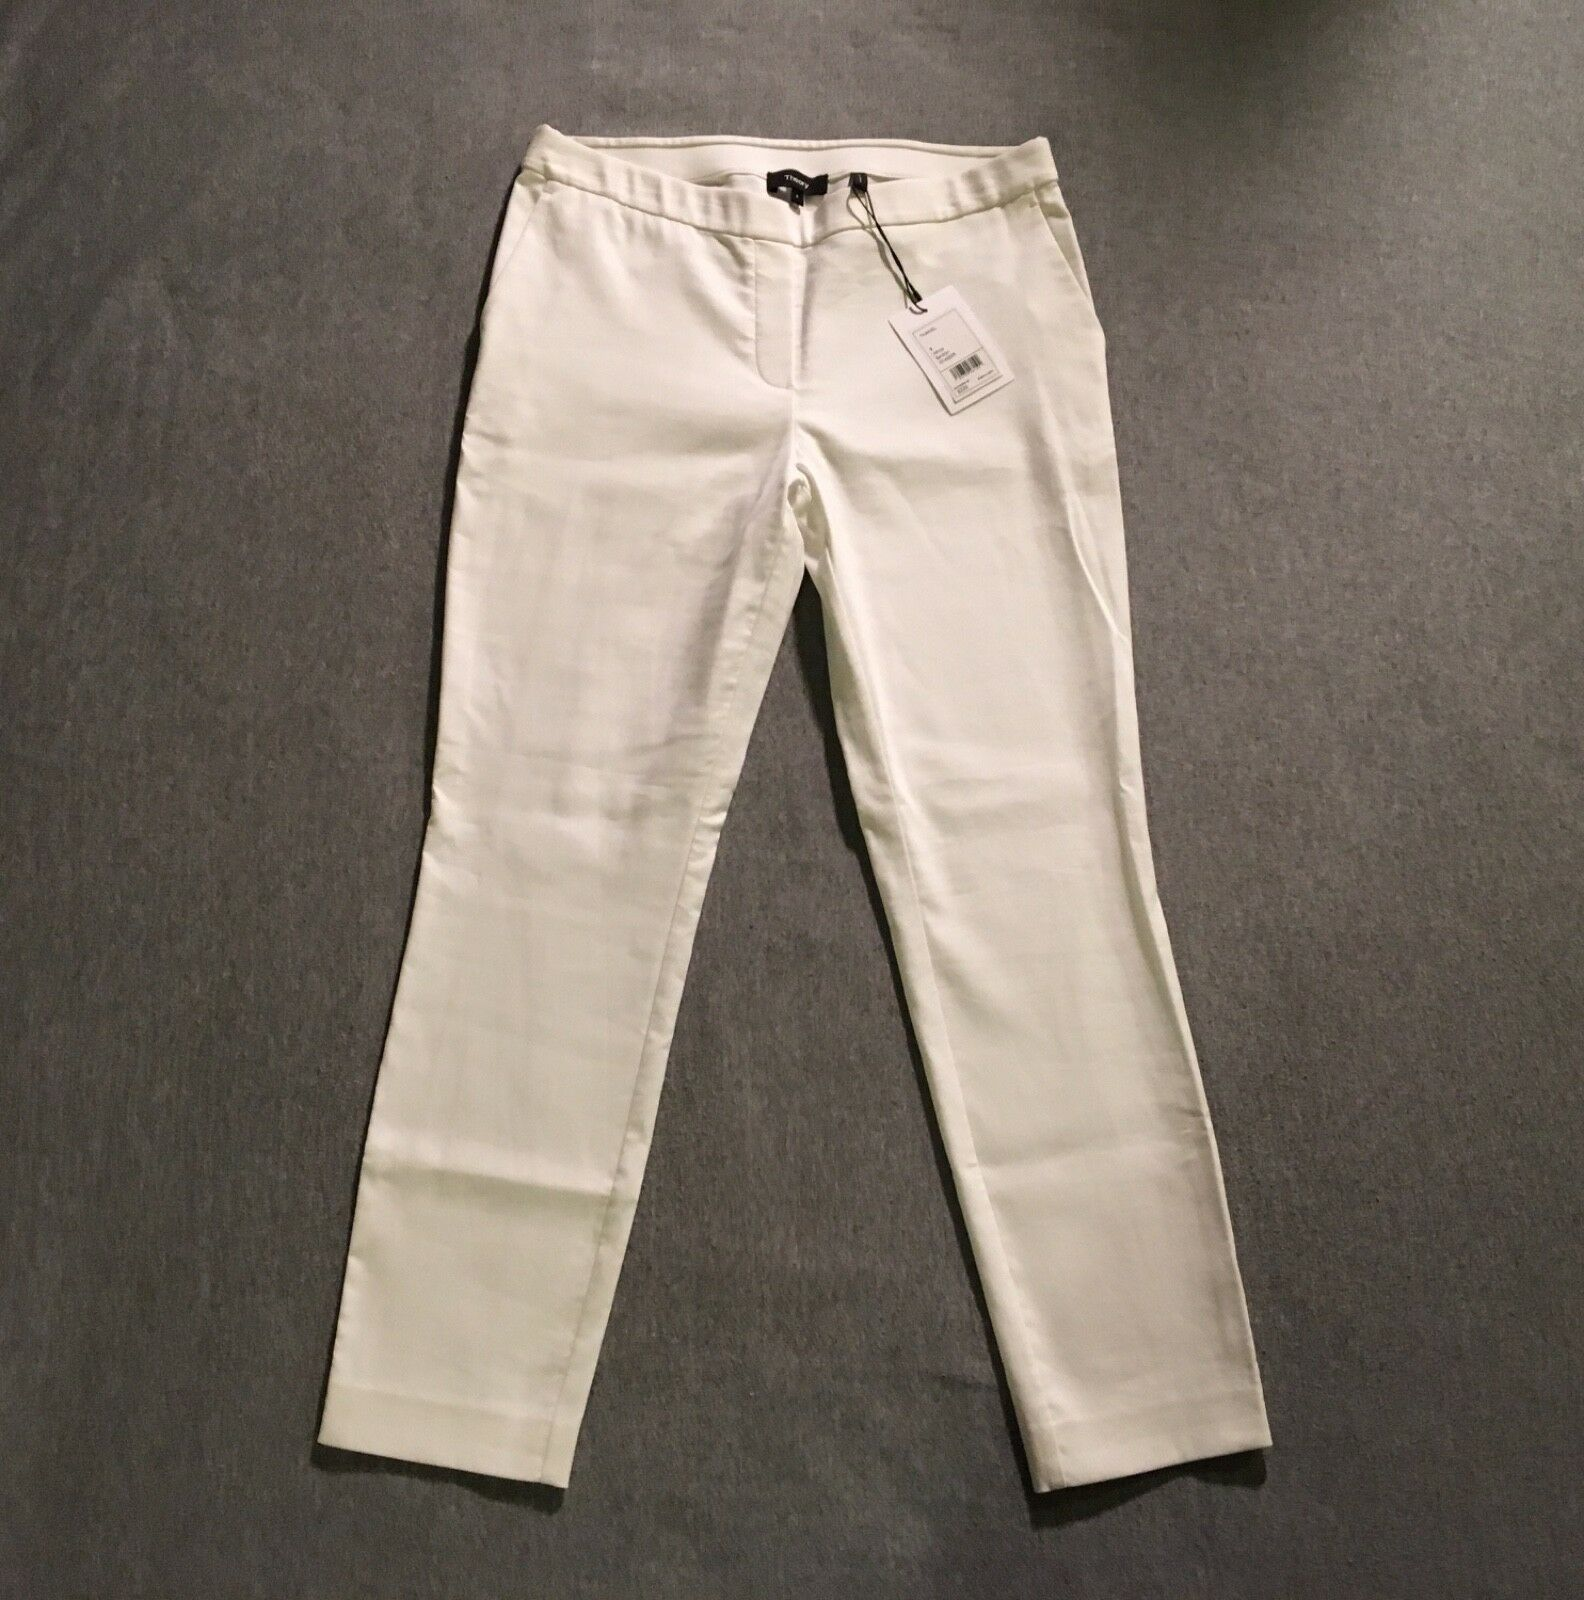 New THEORY Thaniel Sarpton Stretch Cotton Pants Trousers  225 White 8